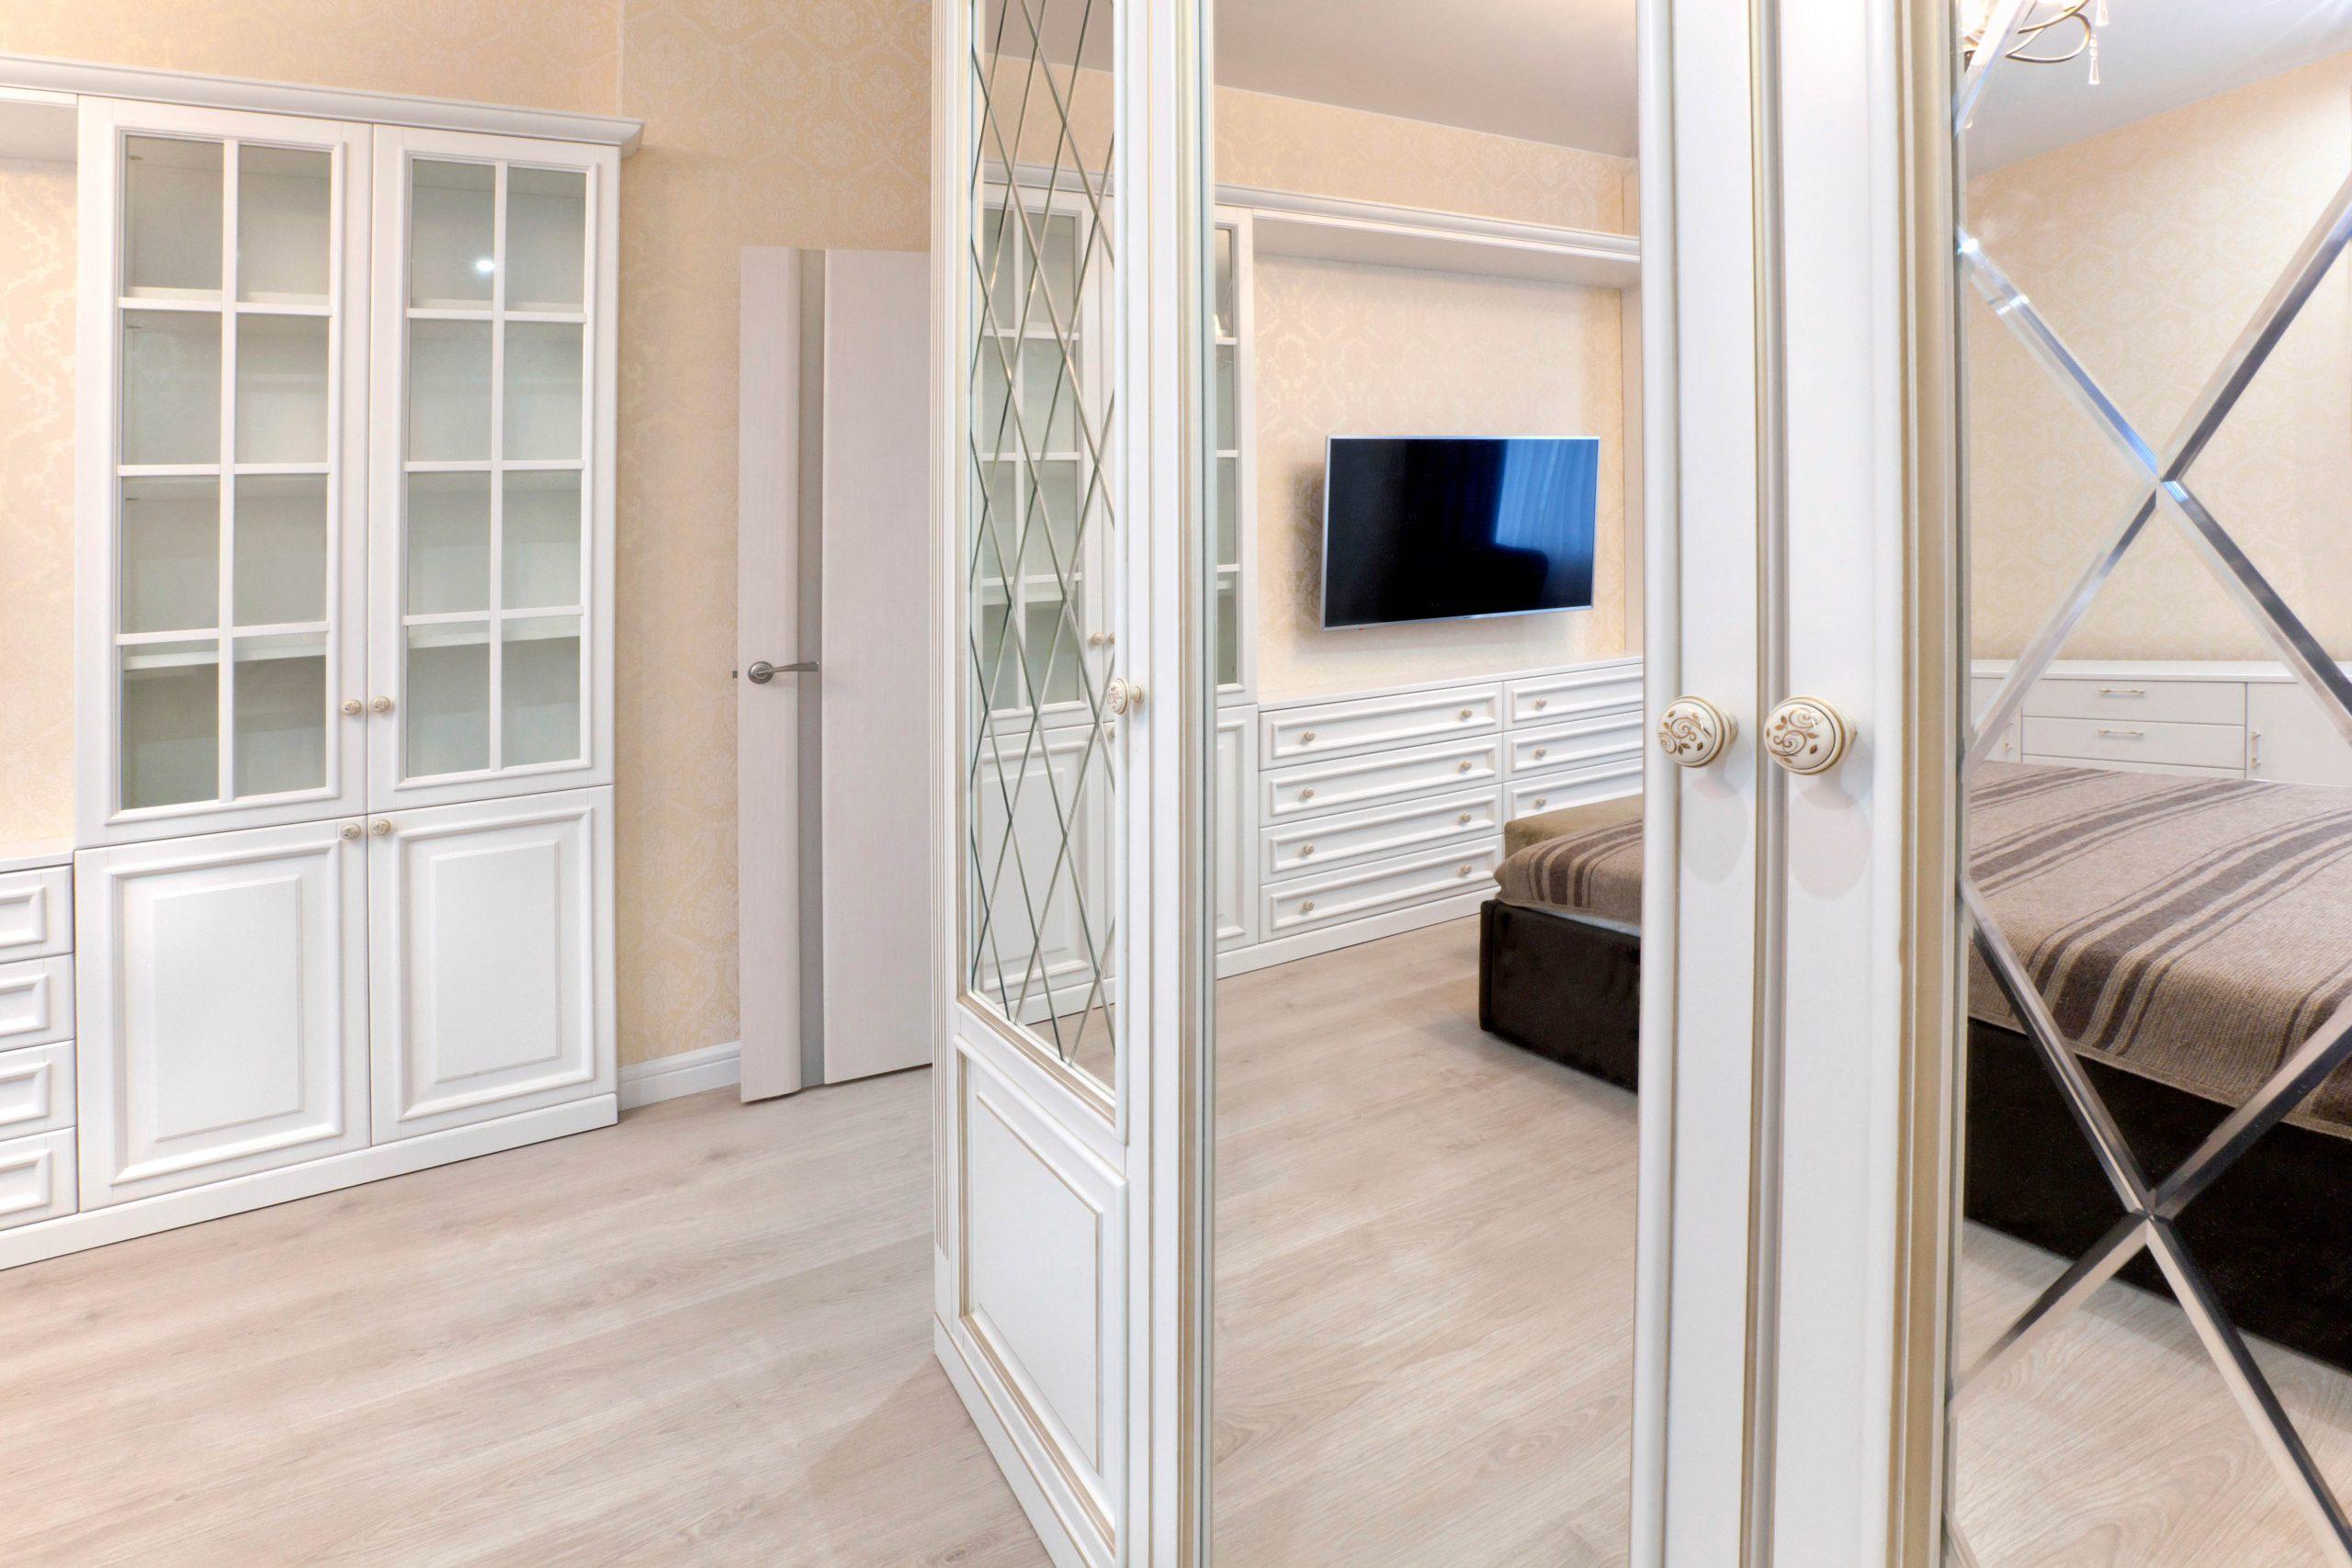 Beveled mirror on decorative door